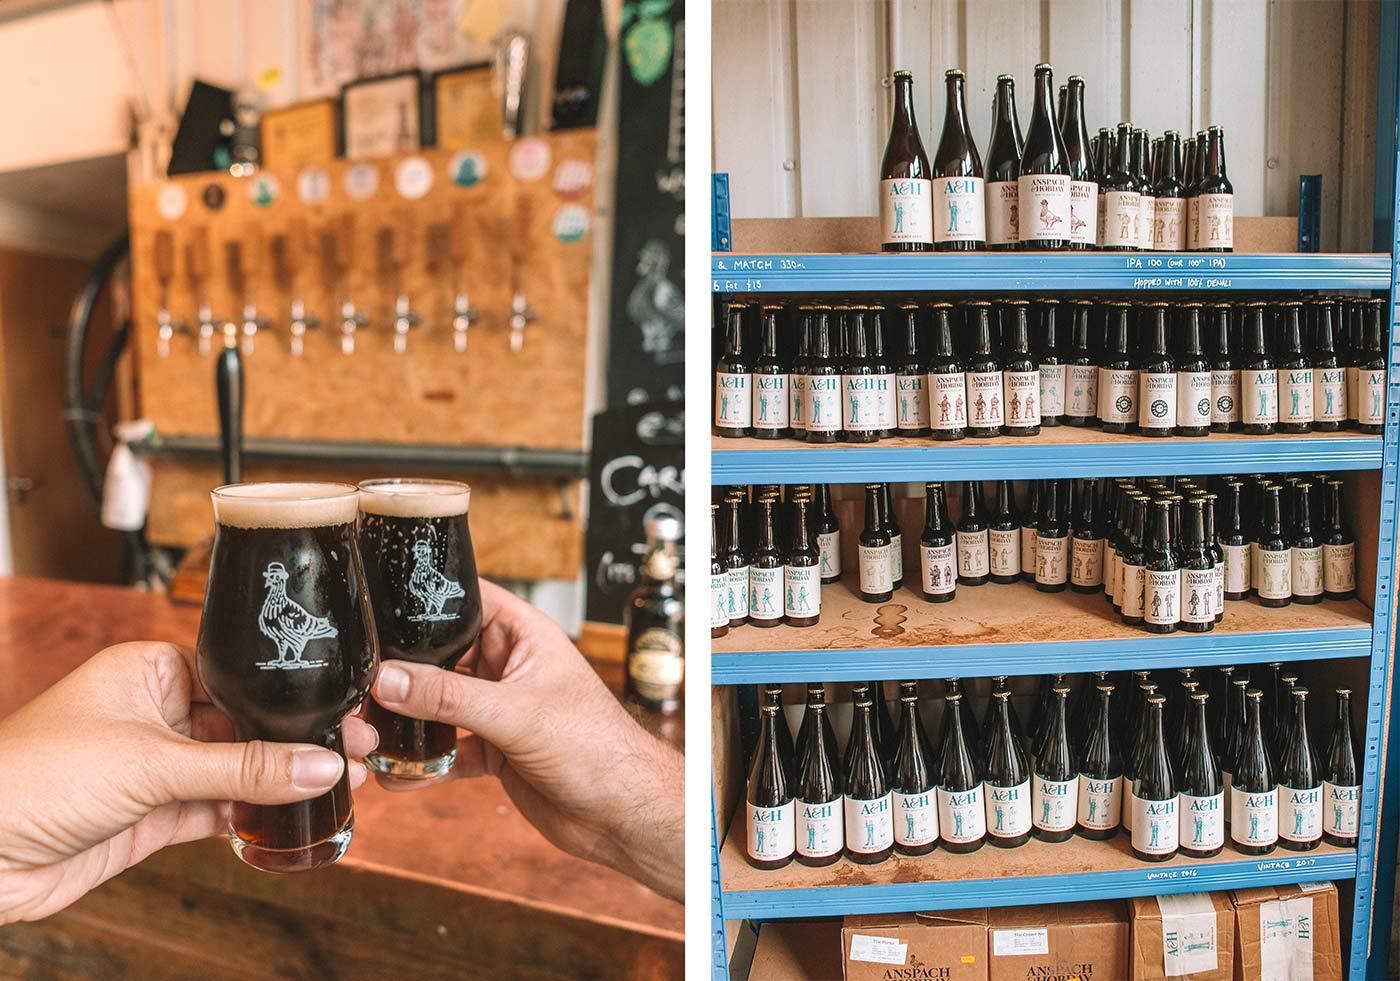 Bermondsey beer mile | Anspach & Hobday Brewery